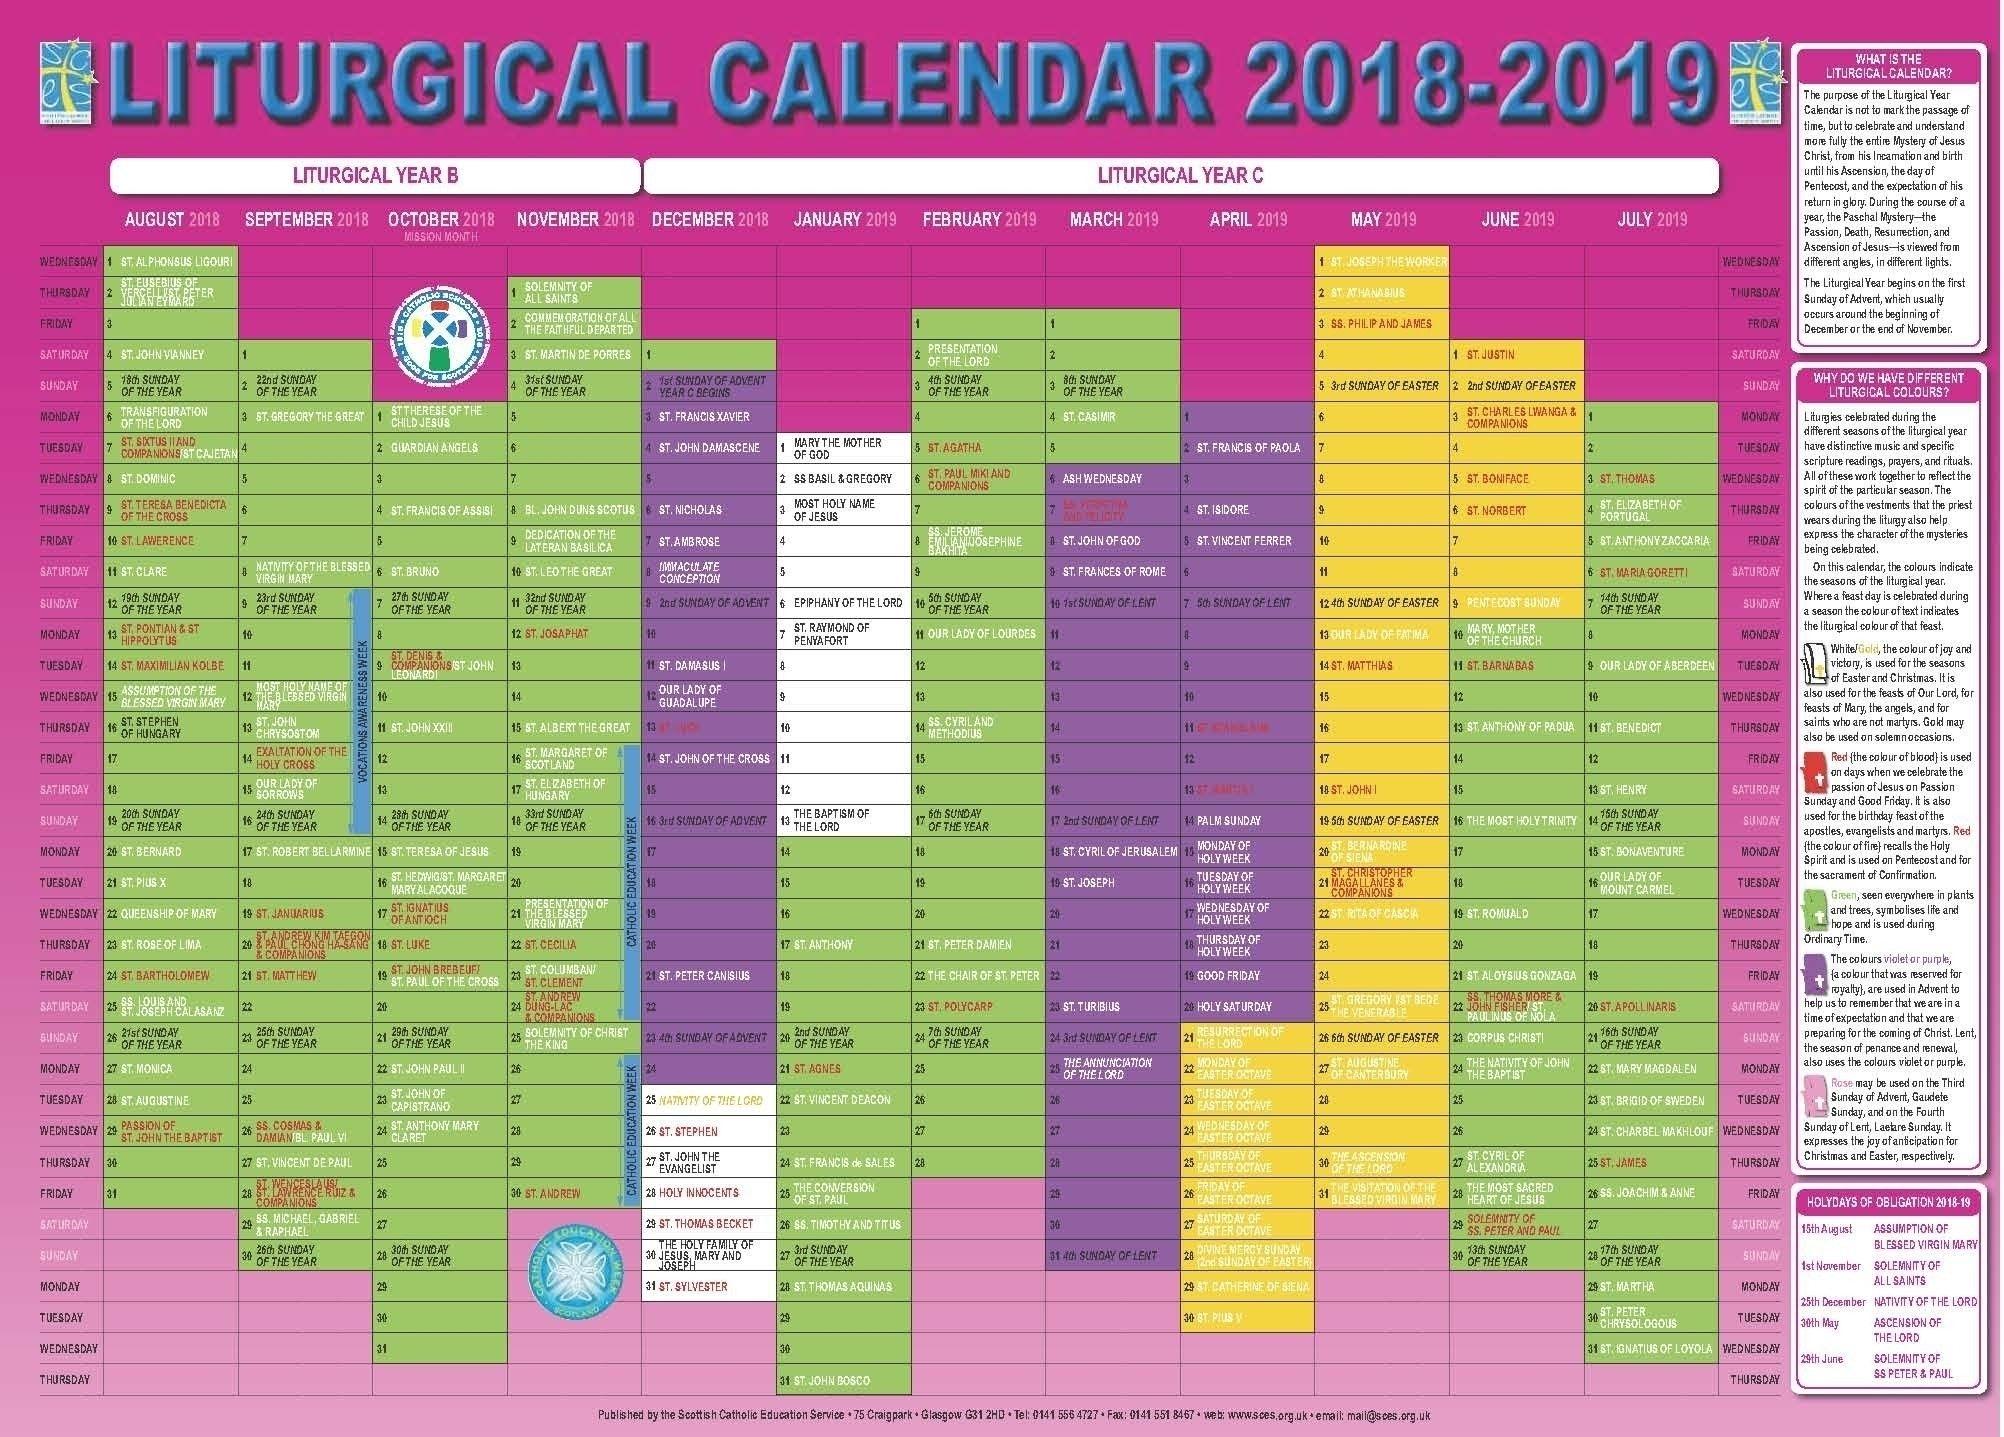 Free Printable Liturgical Calendar In 2020 | Catholic throughout Liturgical Calendar For 2020 Printable